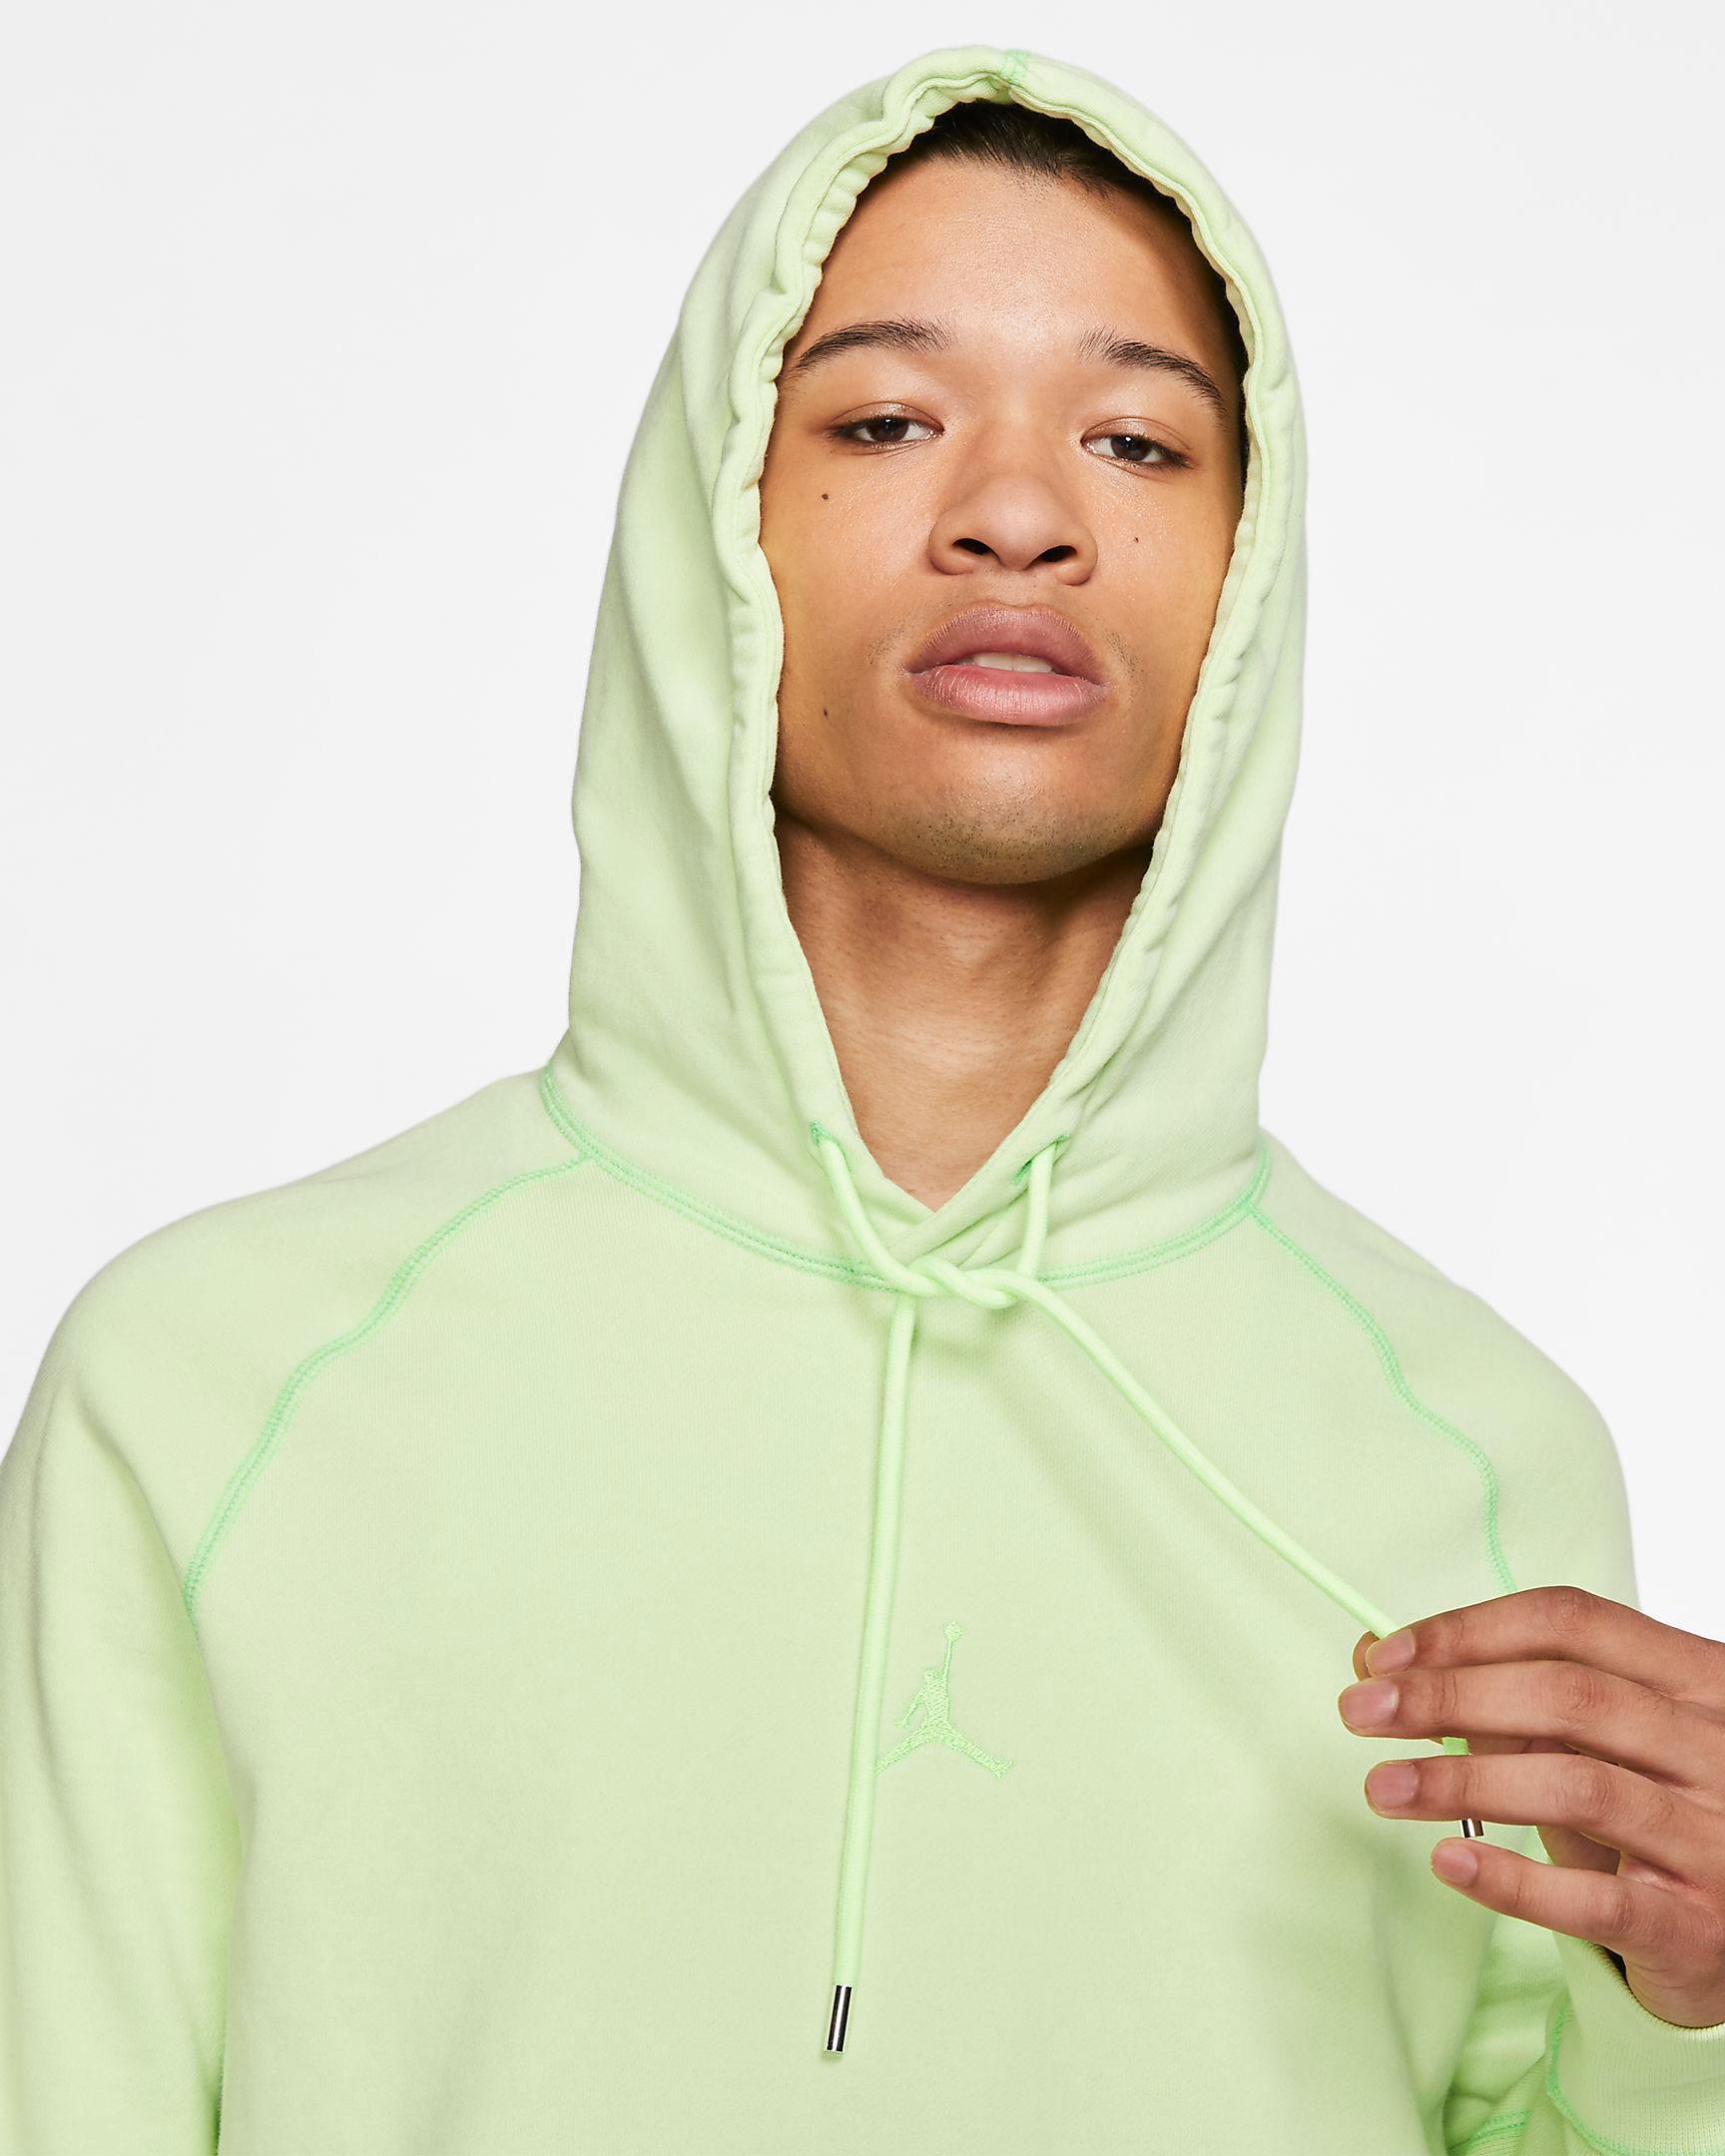 jordan-1-bio-hack-hoodie-match-green-1